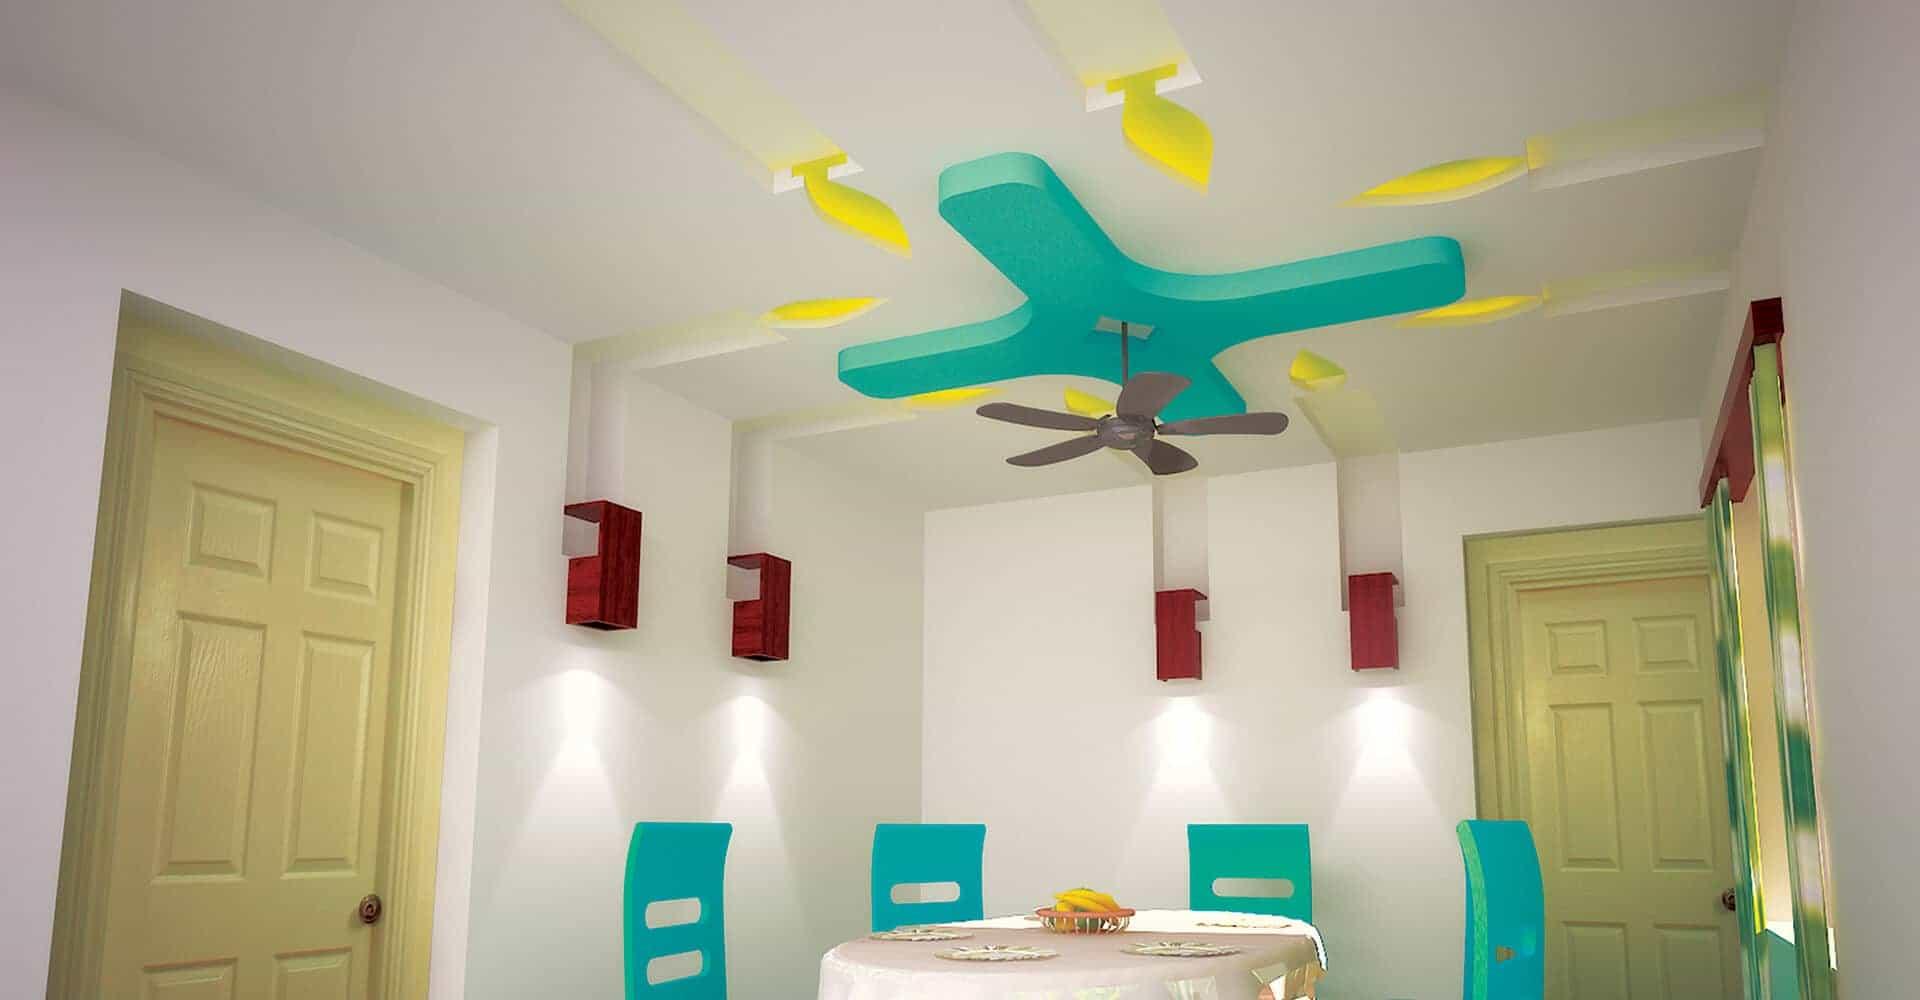 Residential False Ceiling False Ceiling Gypsum Board